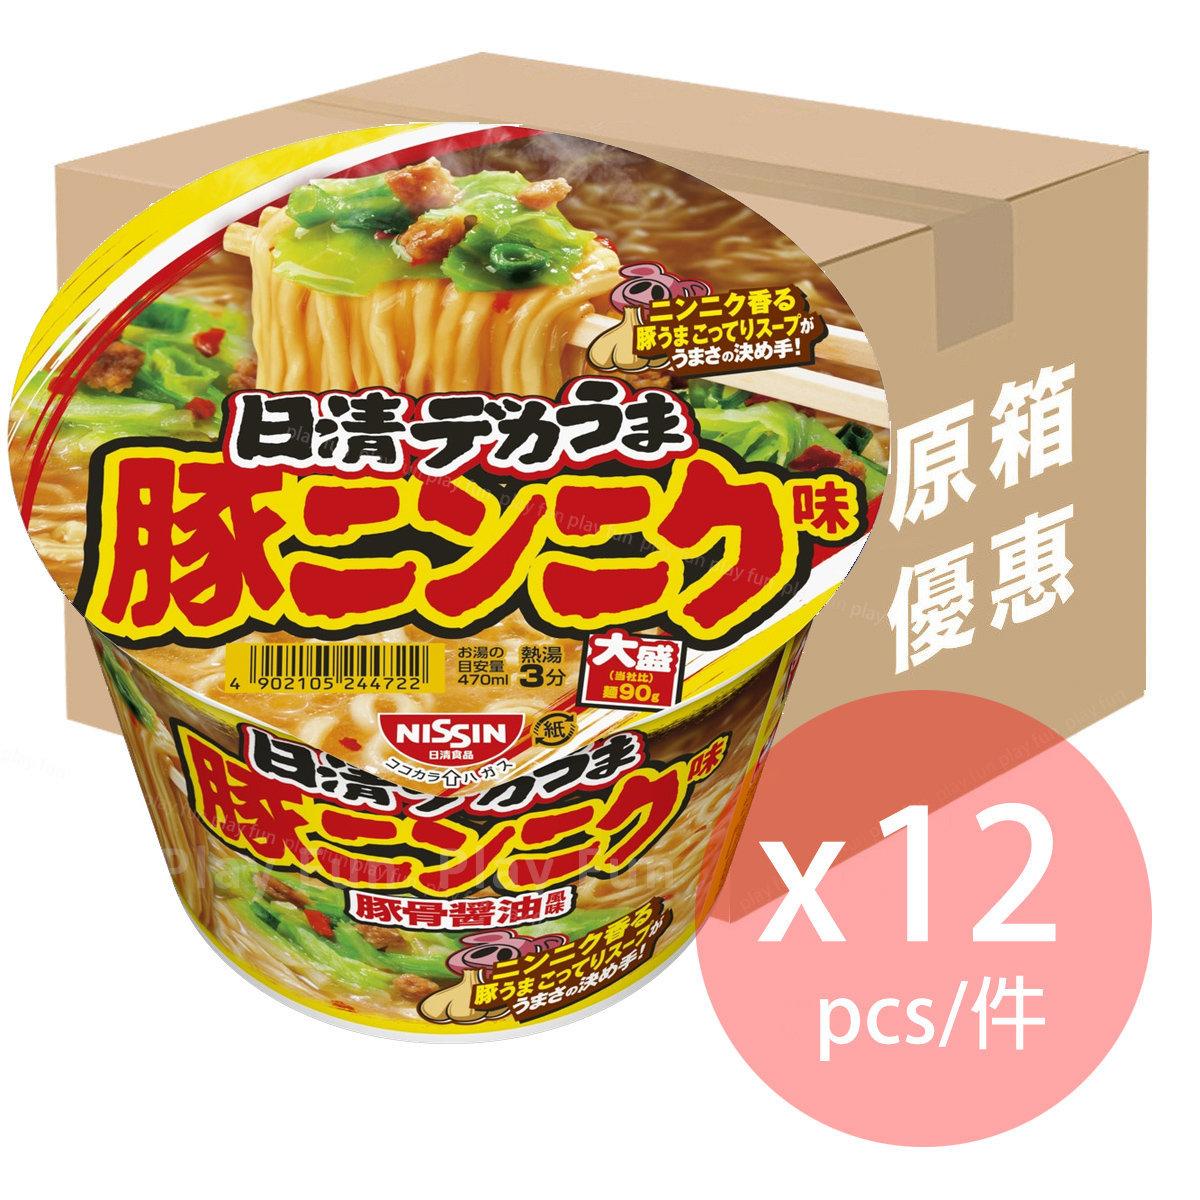 【Full Case】大盛 豚骨蒜香醬油風味拉麵 111g x 12  (4902105256084_12)